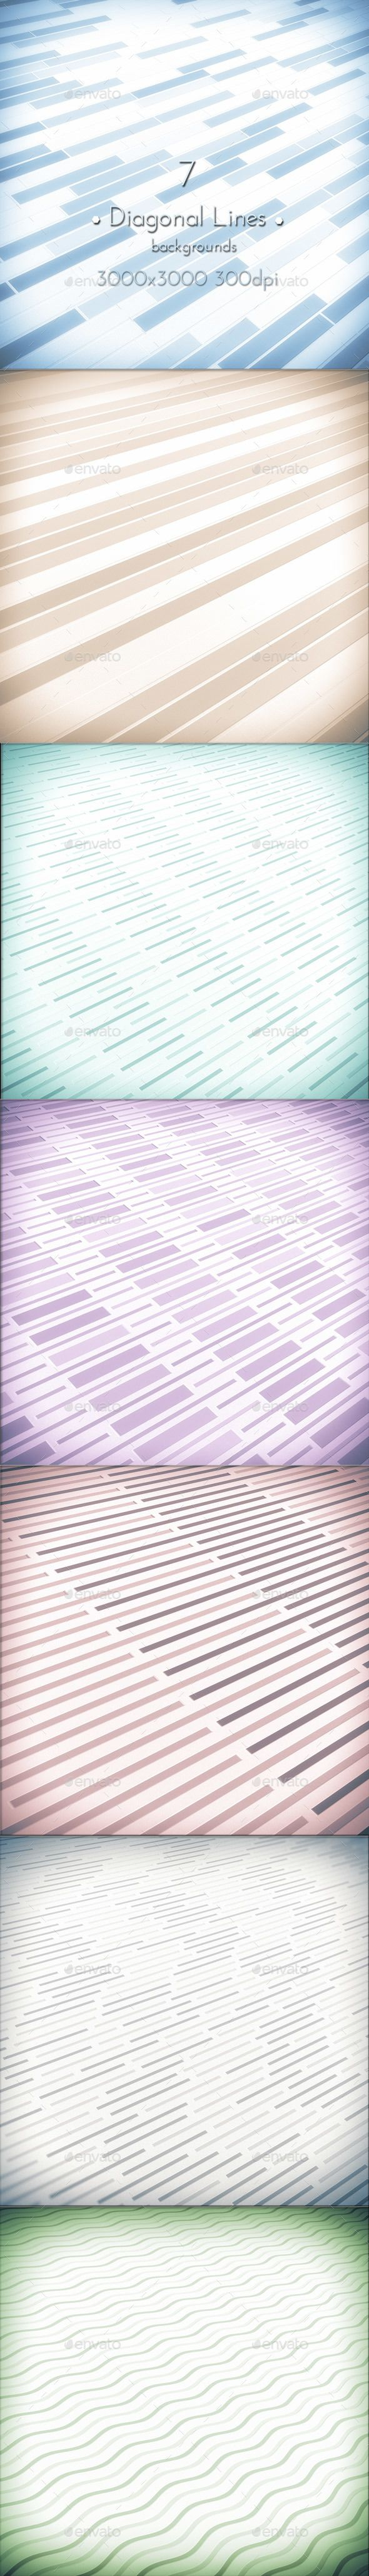 Diagonal Lines Soft Tone Square Wallpapers, 7 Hi-res Jpeg images, 3000×3000 (square format) 300 dpi. #design